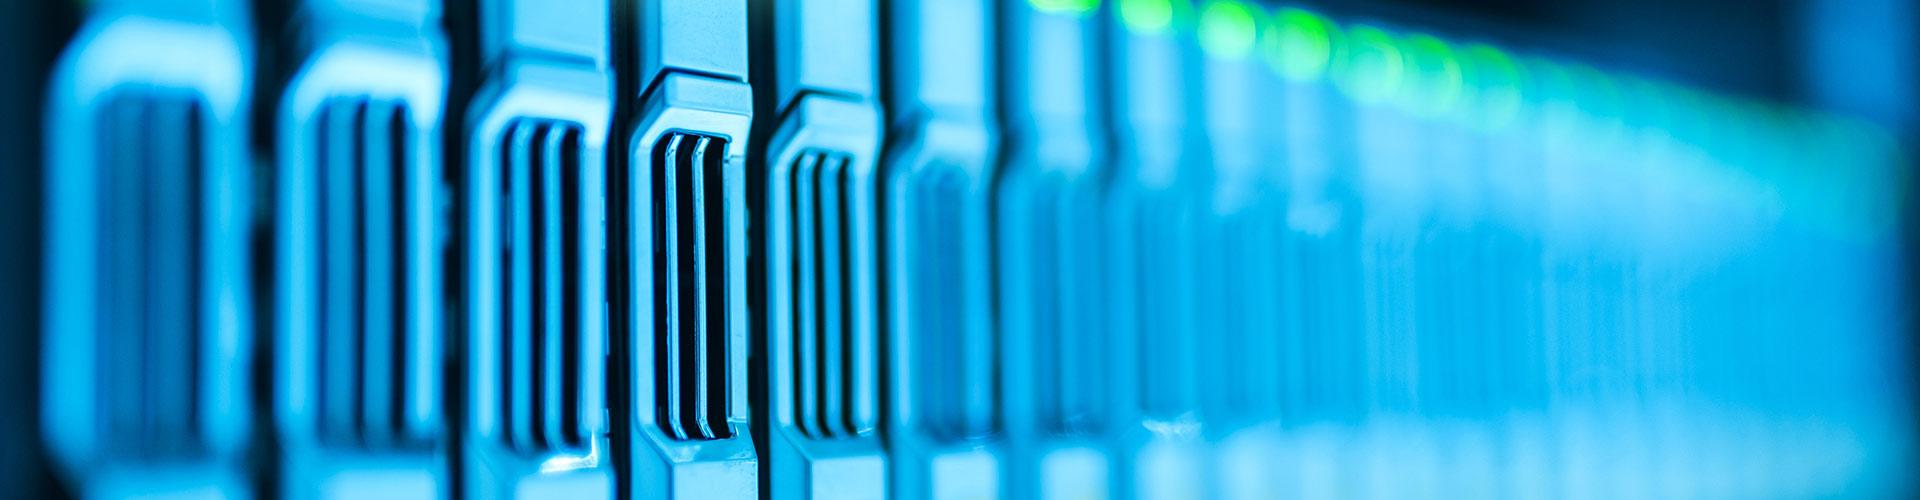 web hosting domains samui graphic design 1